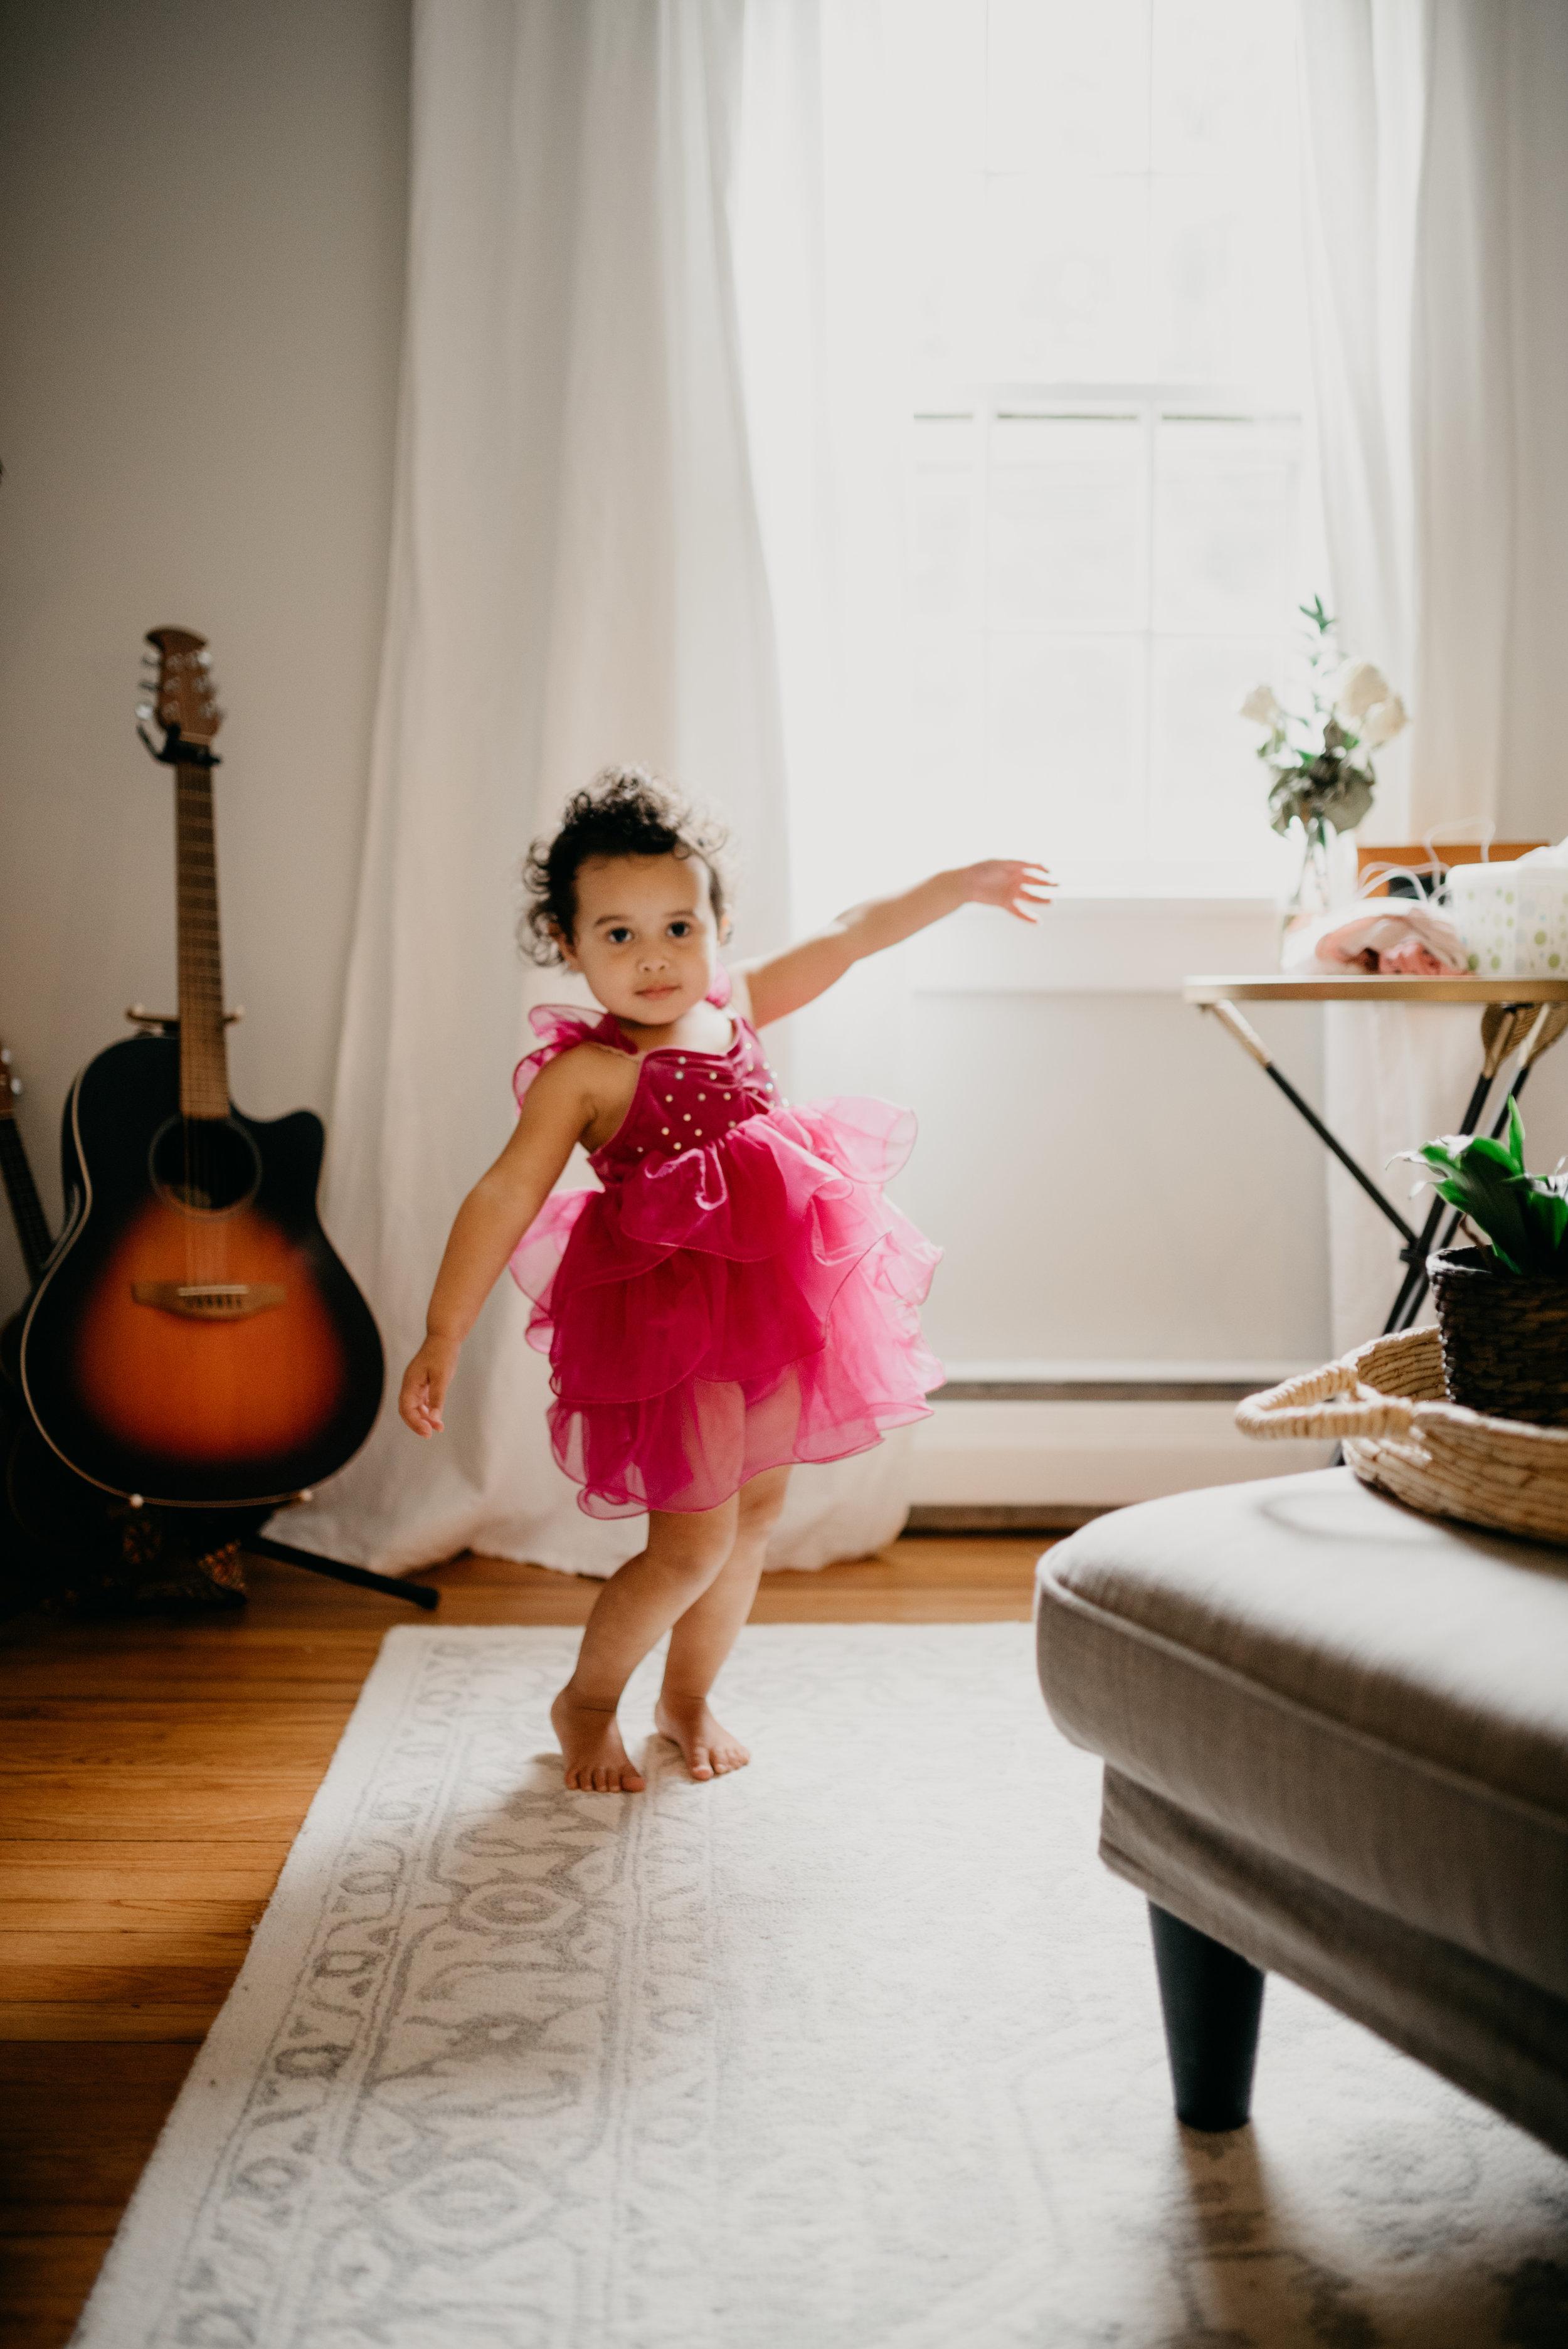 Ehrman-Massachusetts-In Home Lifestyle Maternity Session-Documentary Family Photographer-47.jpg